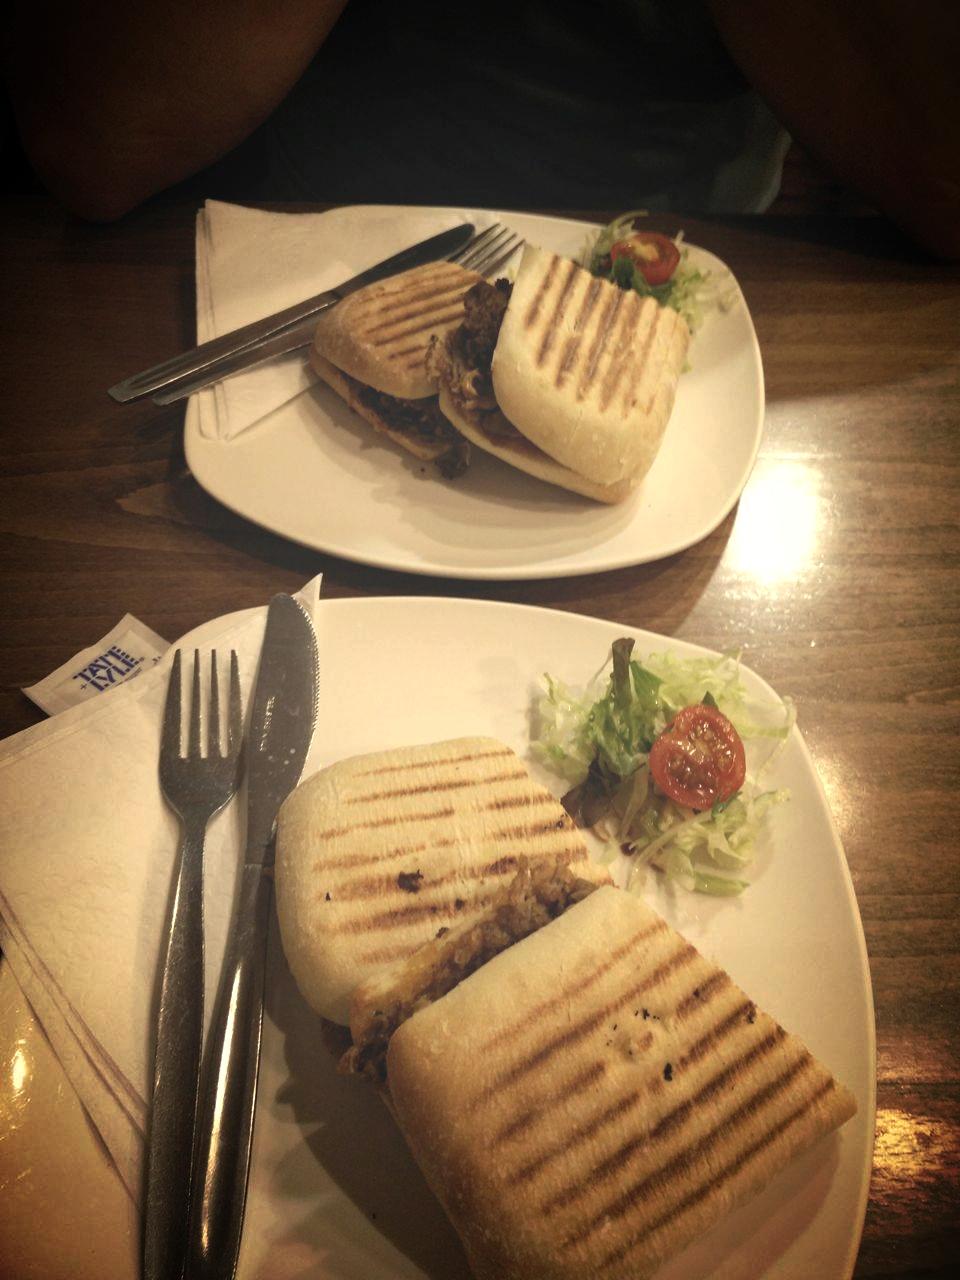 Superpeach Wales blog Le Rendevous cafe pulled pork baguette